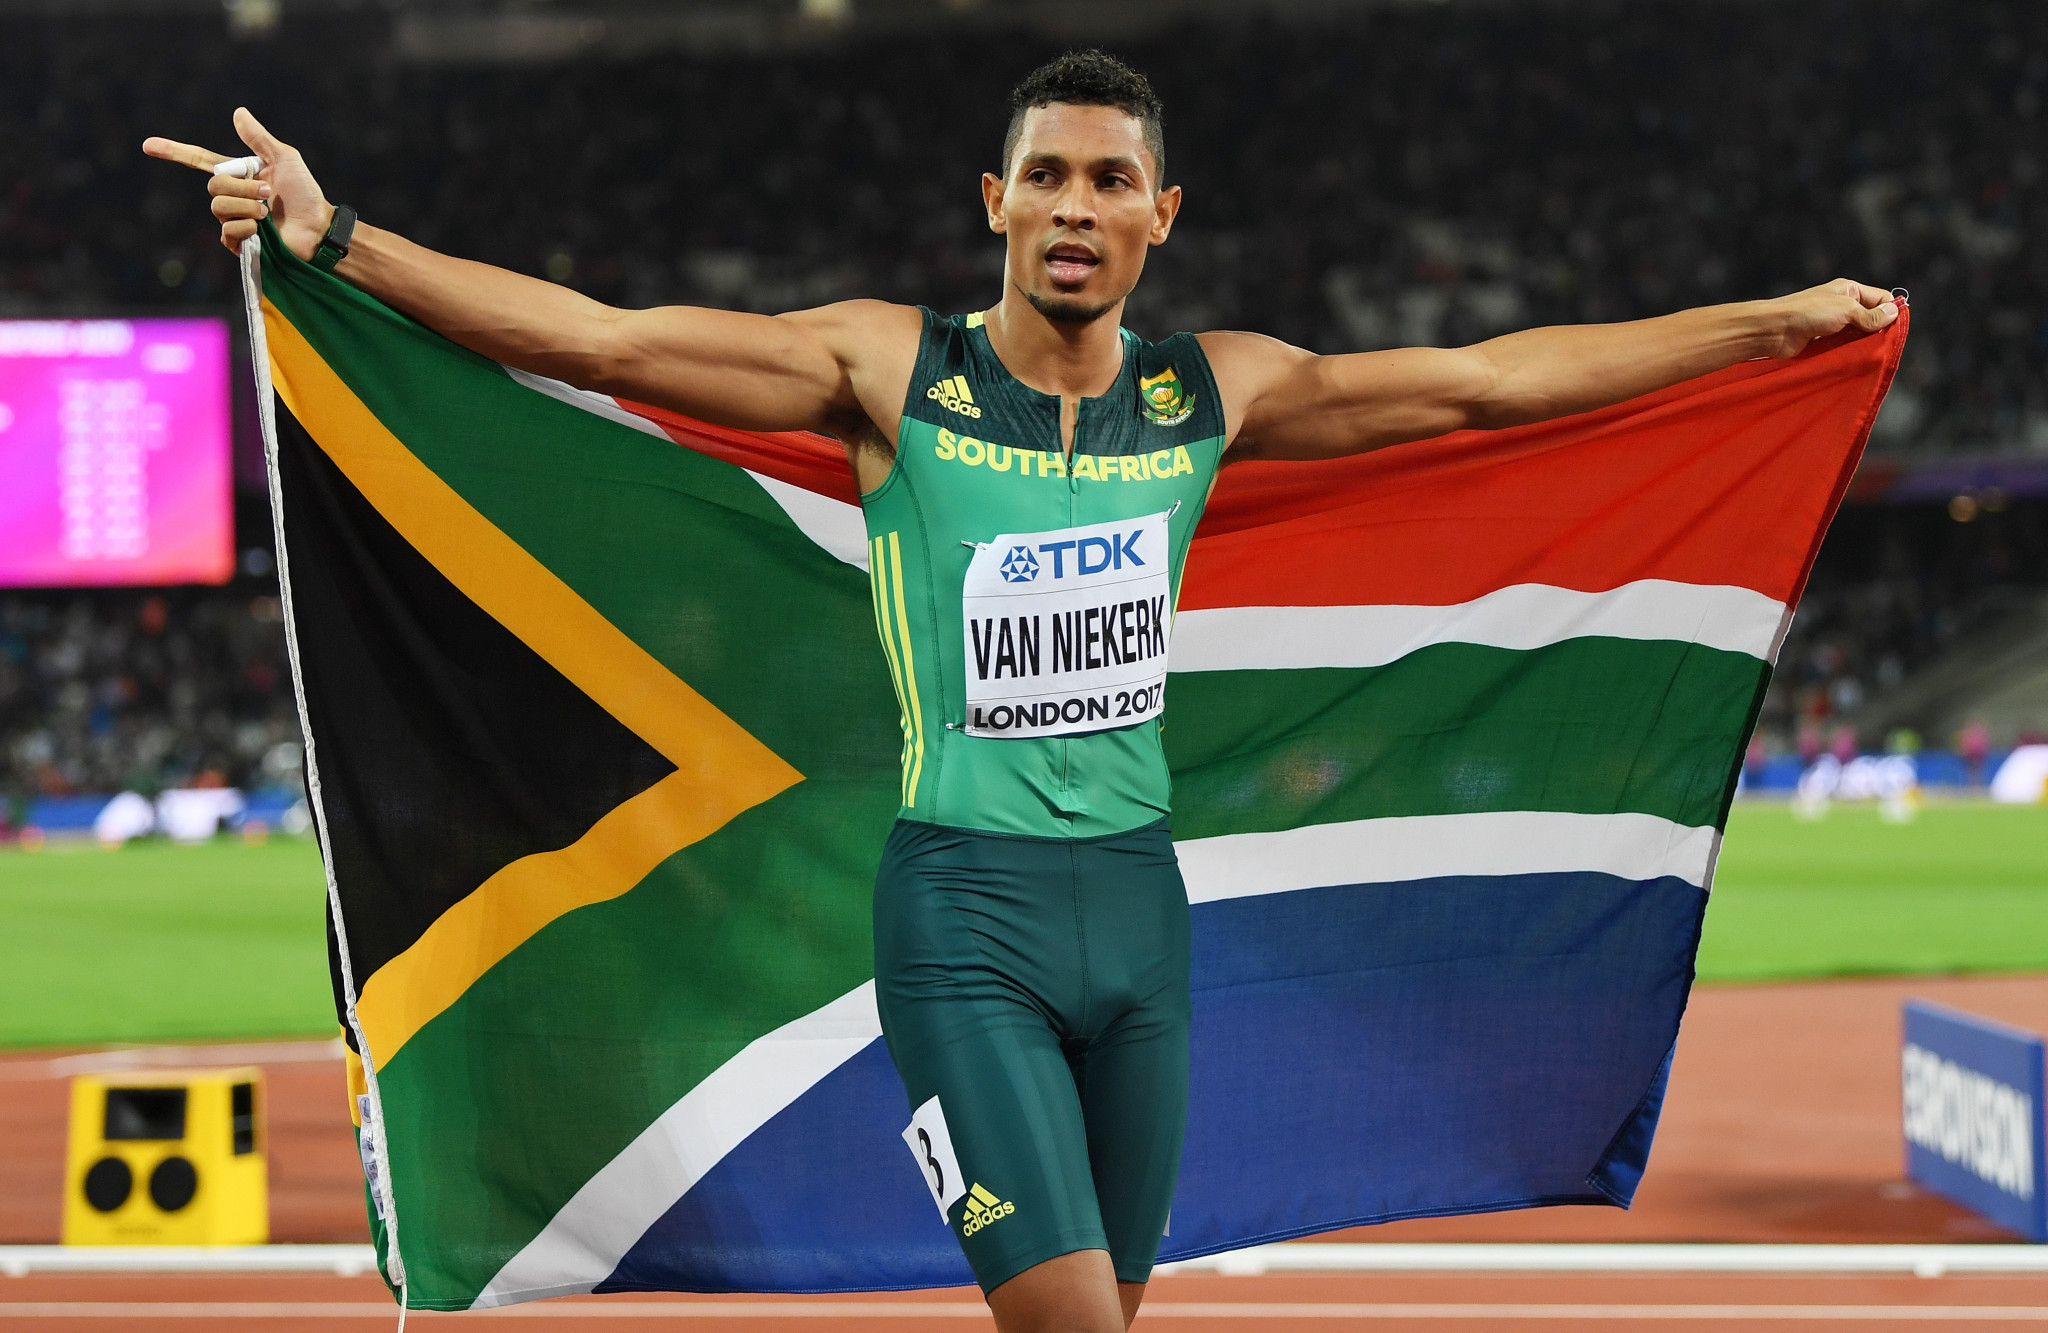 Olympic 400m champion Van Niekerk switches coach in run-up to Tokyo 2020